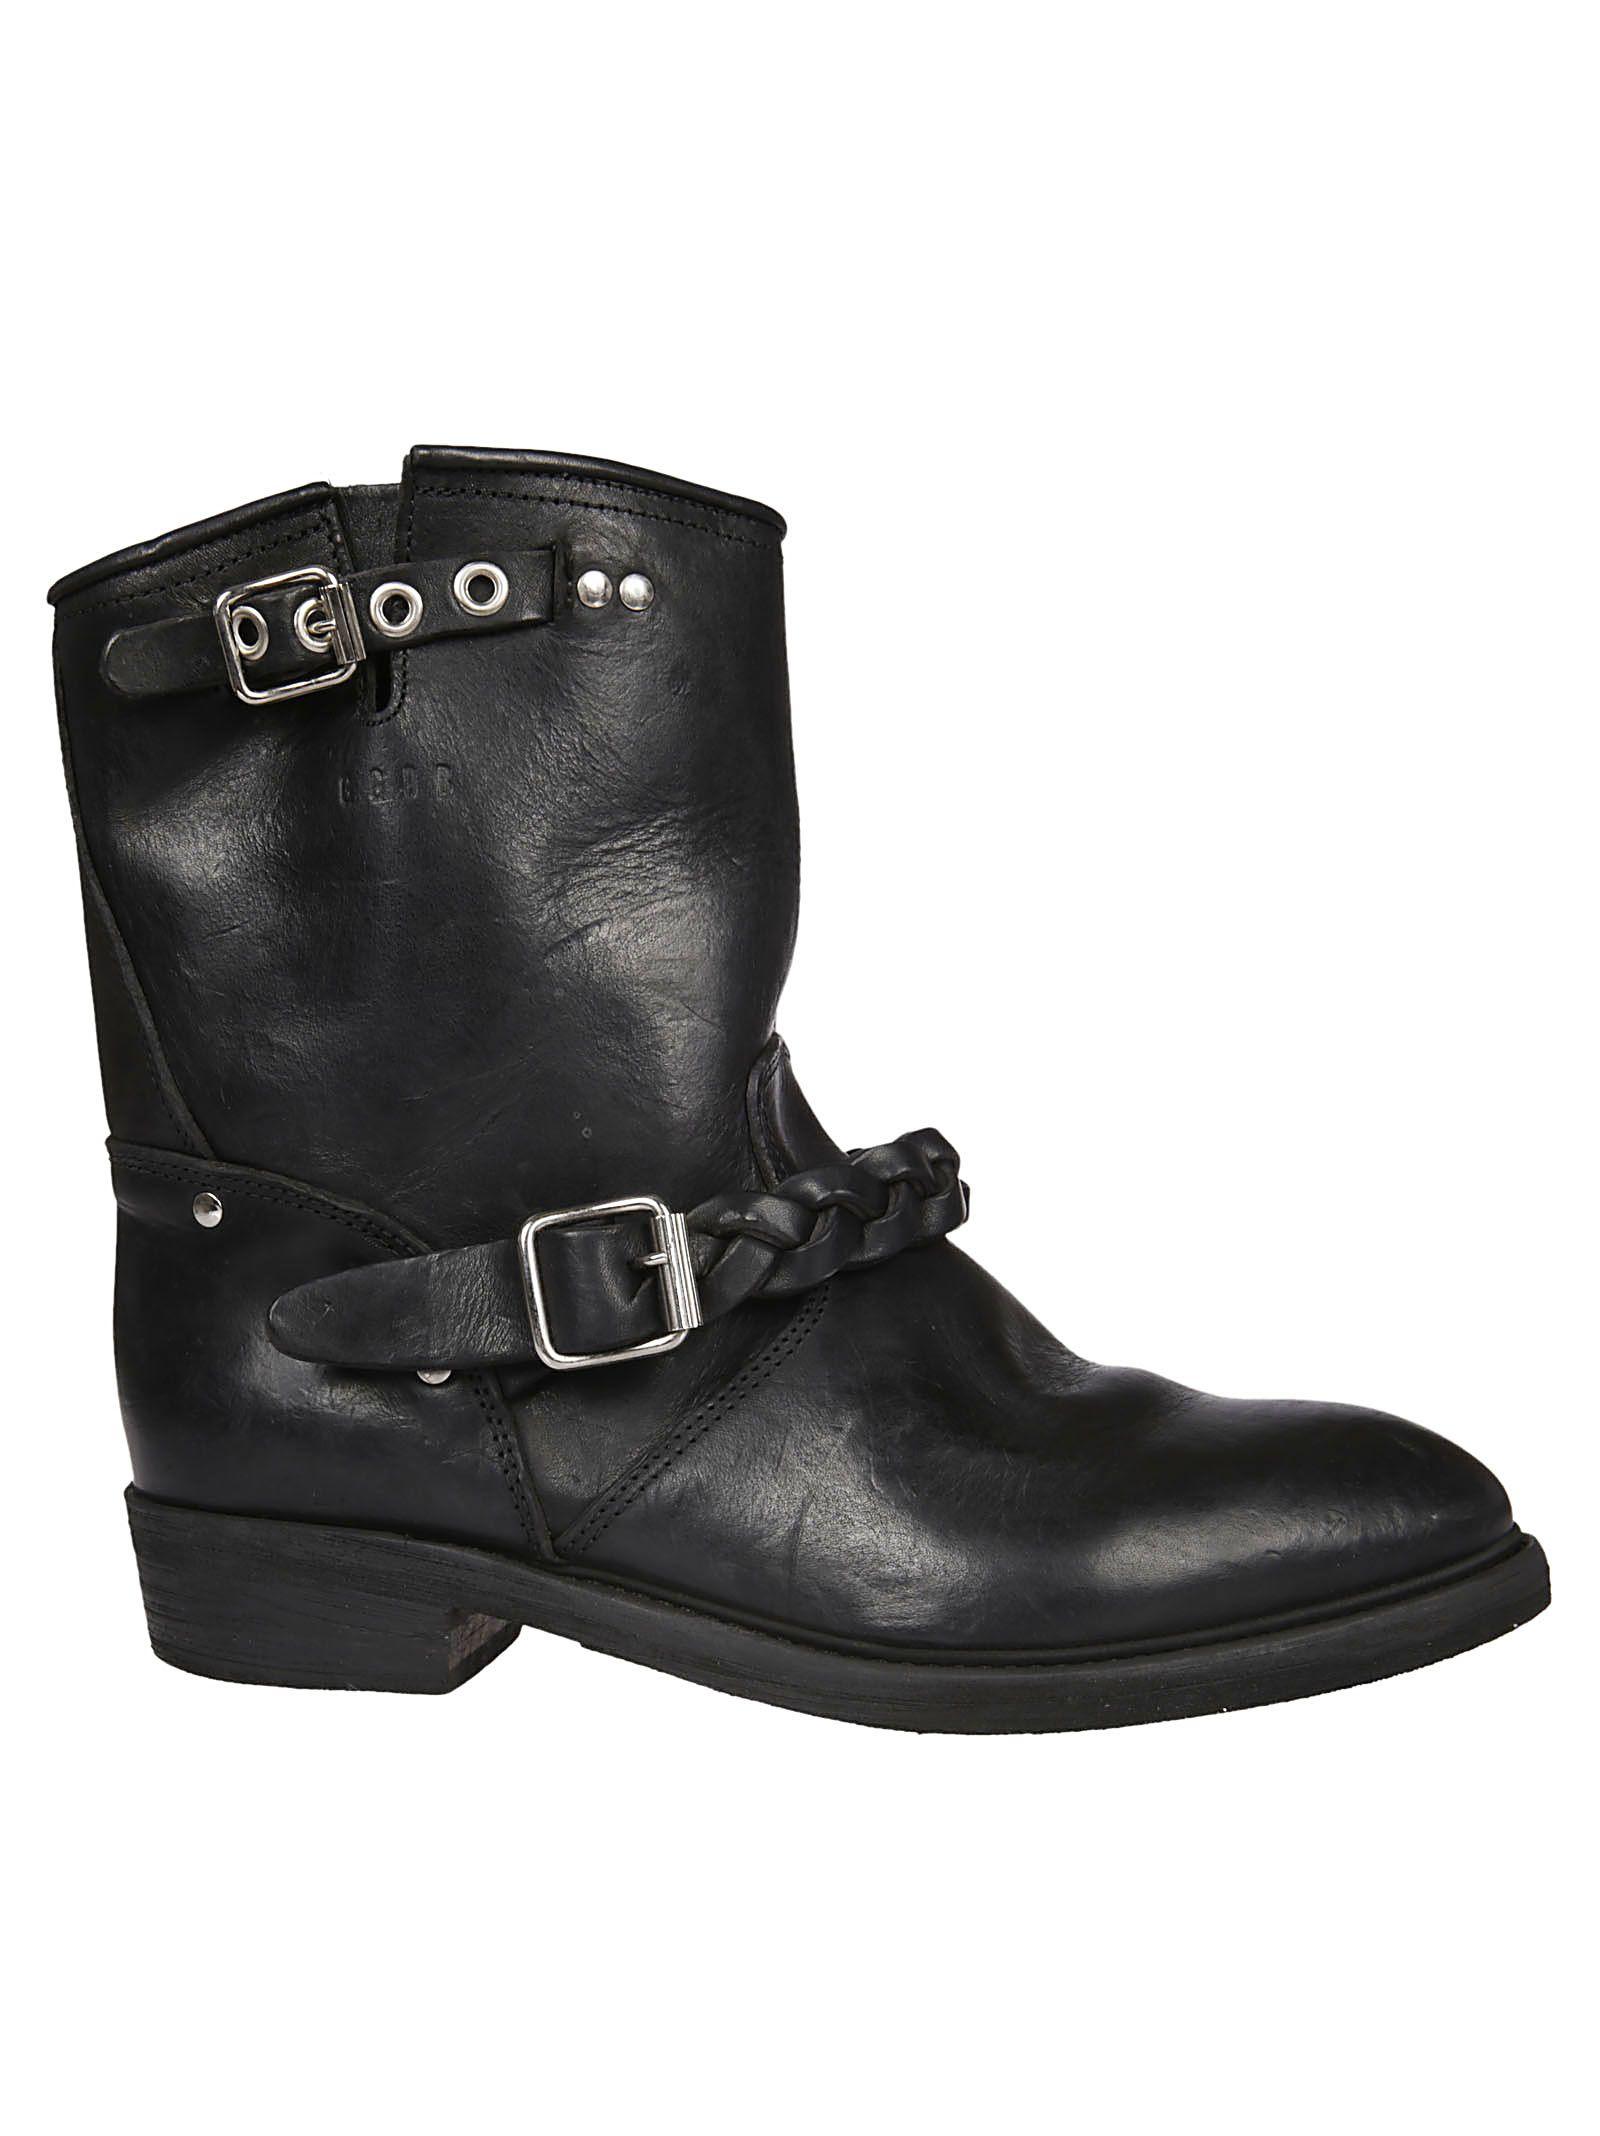 golden goose golden goose braided strap biker boots black women 39 s boots italist. Black Bedroom Furniture Sets. Home Design Ideas